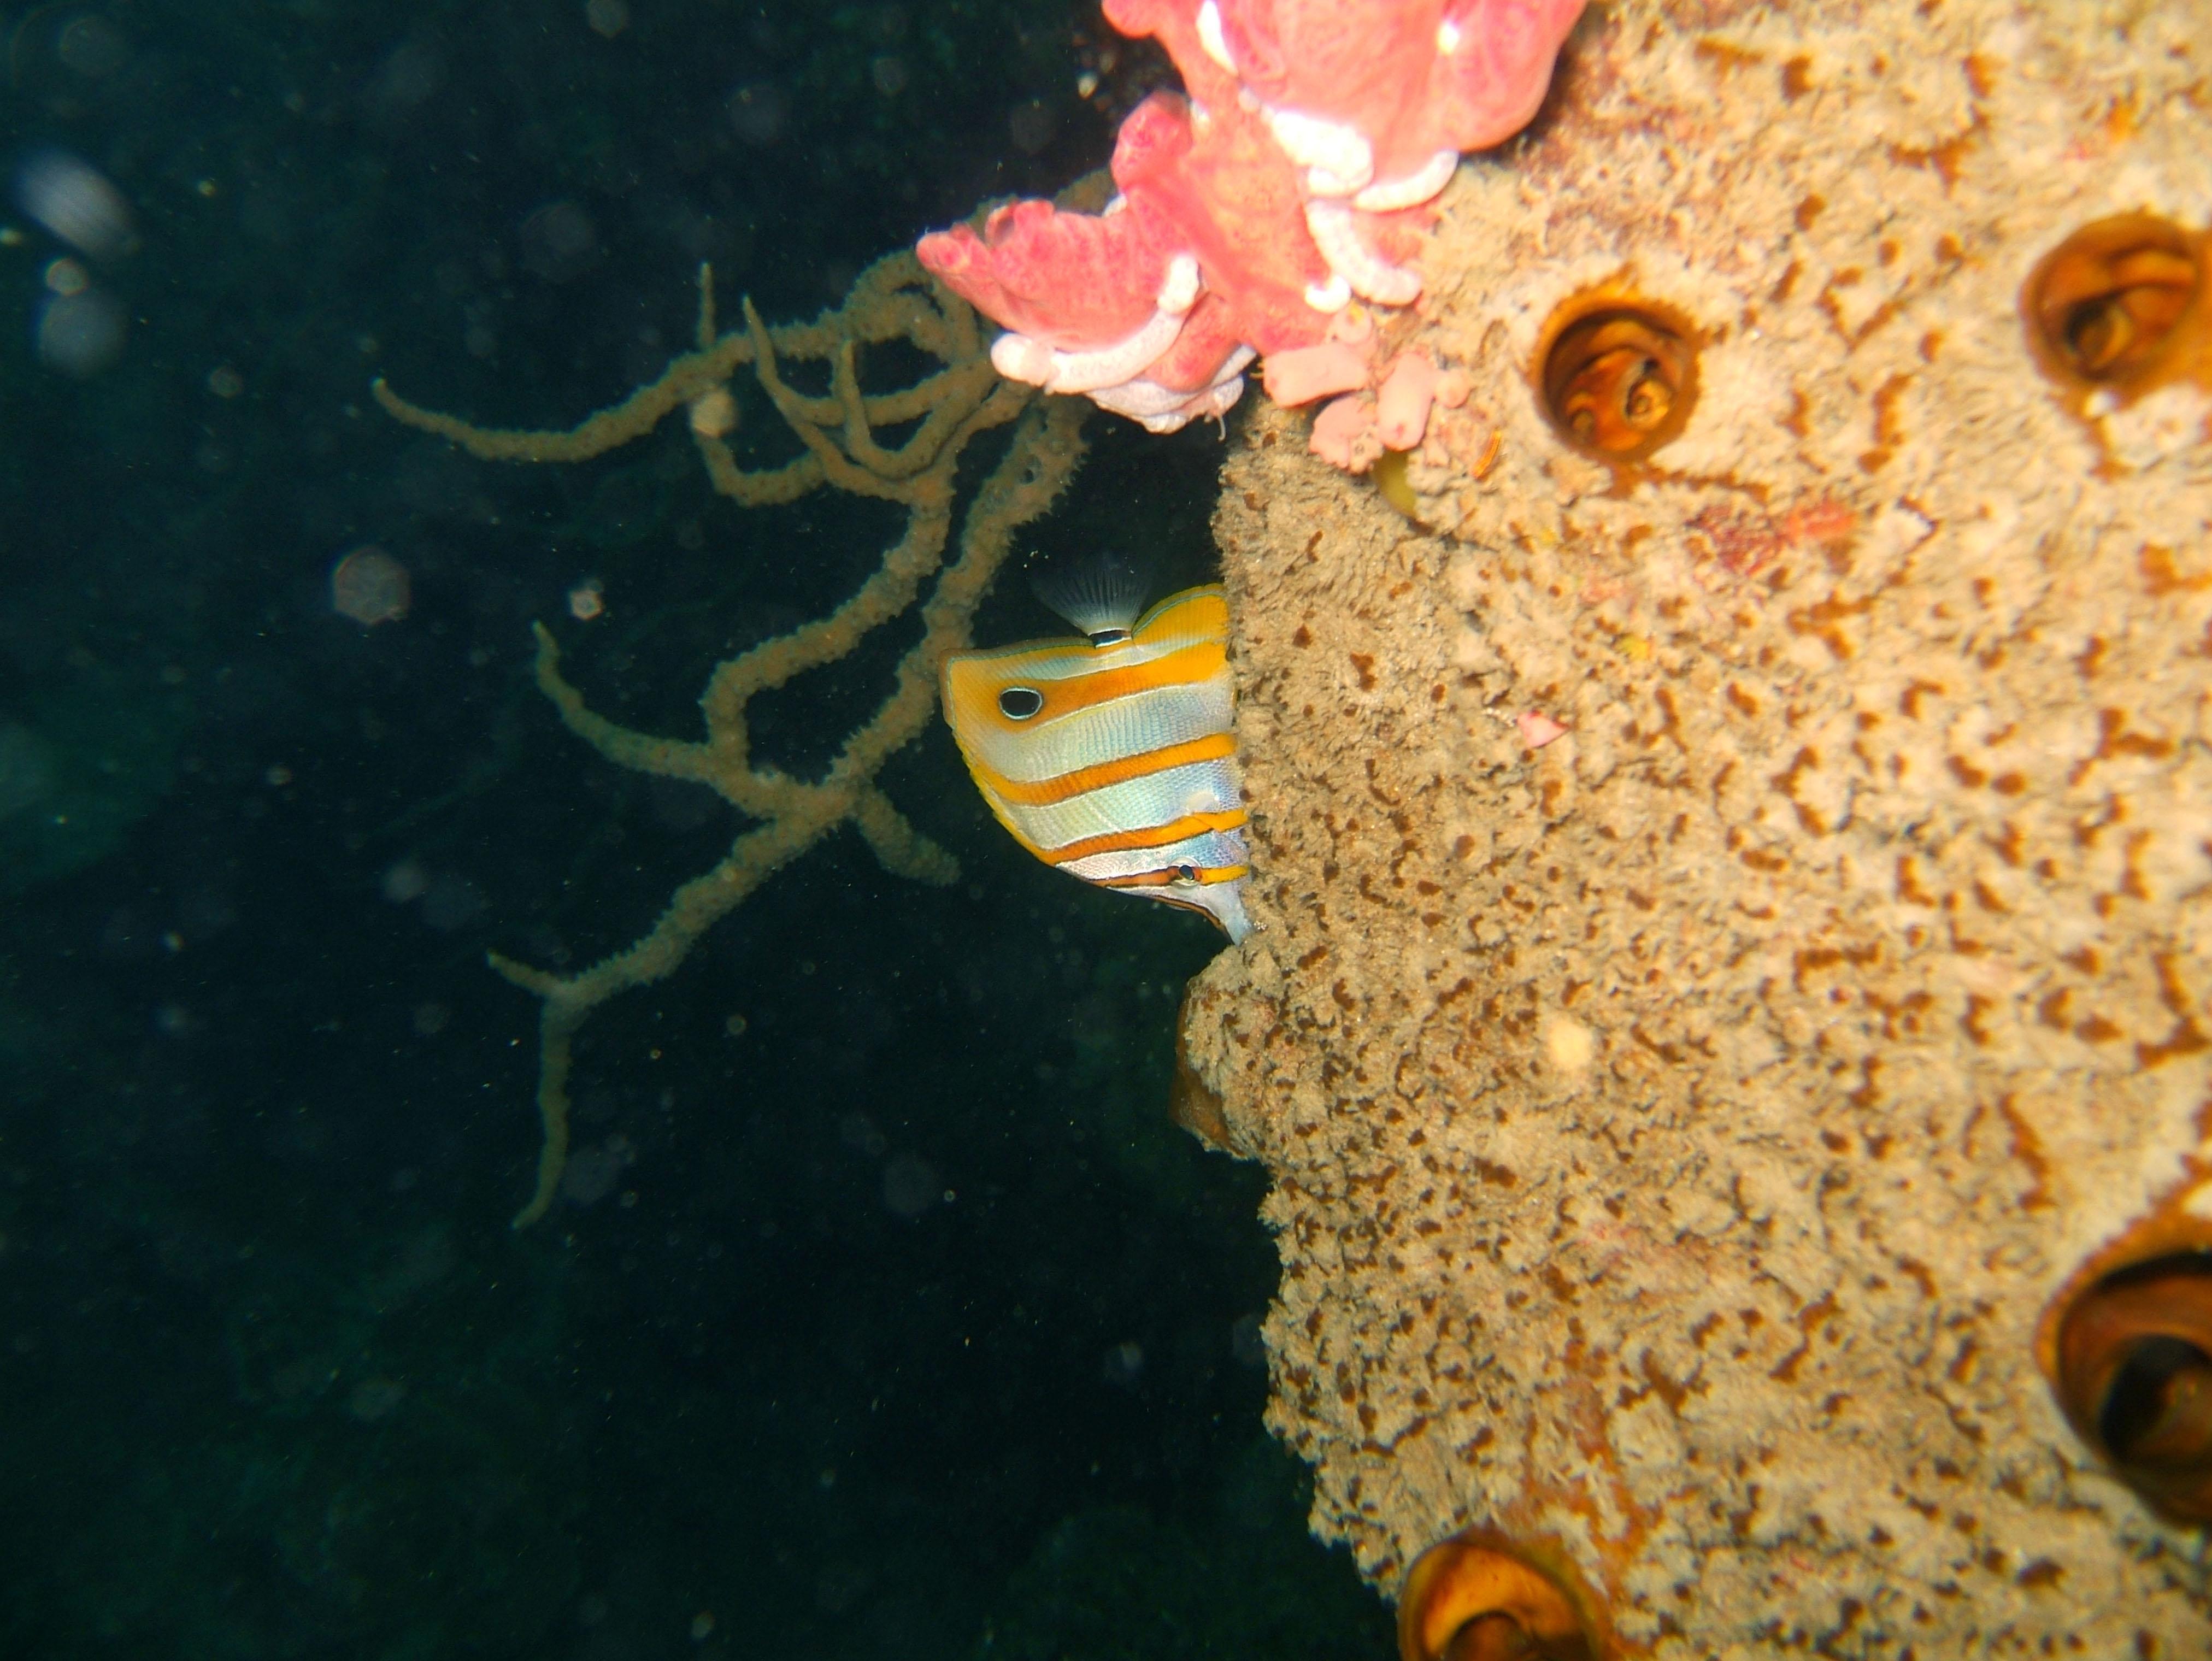 Coron dive site 11 Cay Angan Lake Baracuda Lake Reef July 2005 19